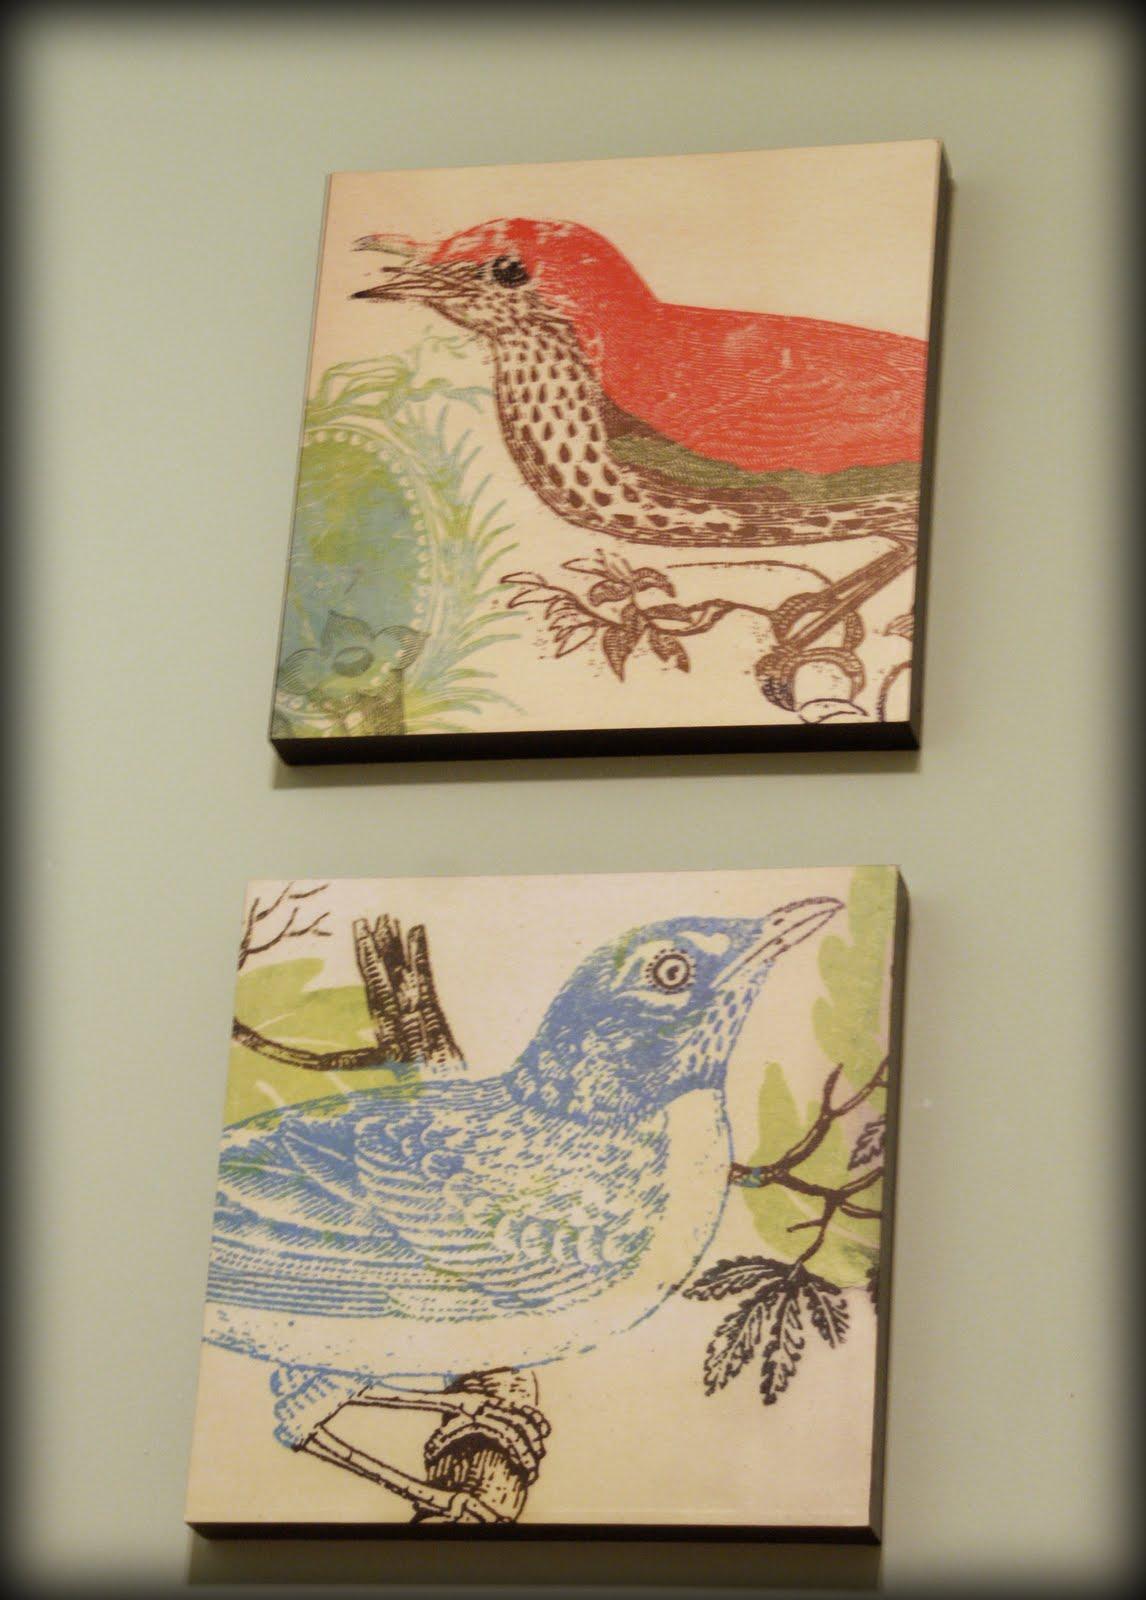 & Fabric Wall Art DIY; My Retro Kitchen